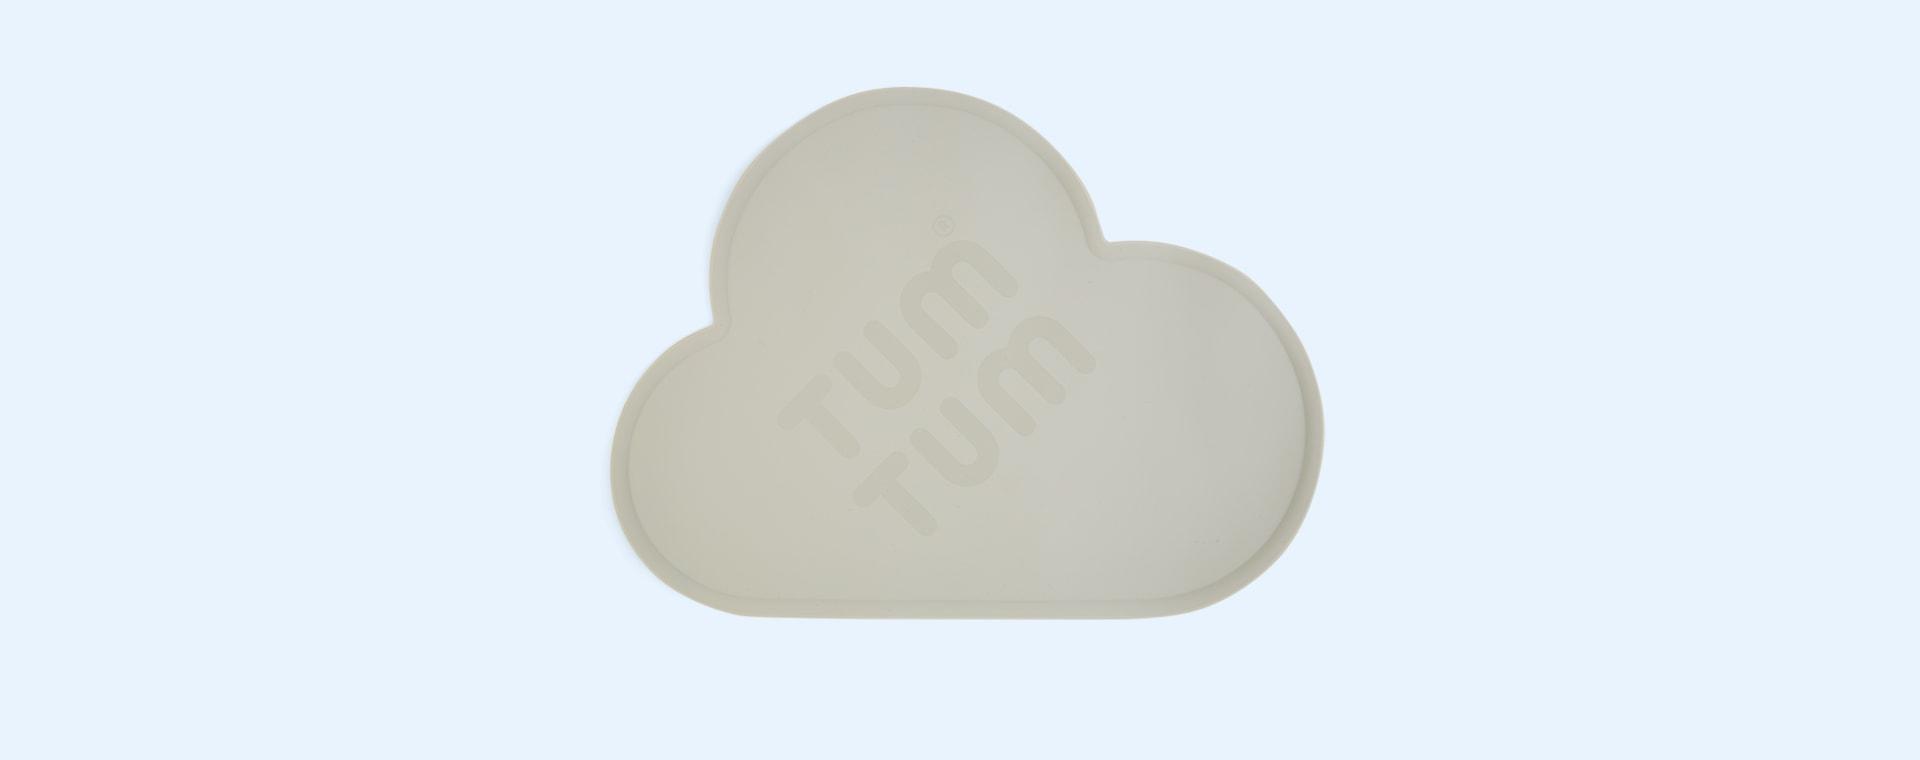 Grey Tum Tum Cloud Placemat